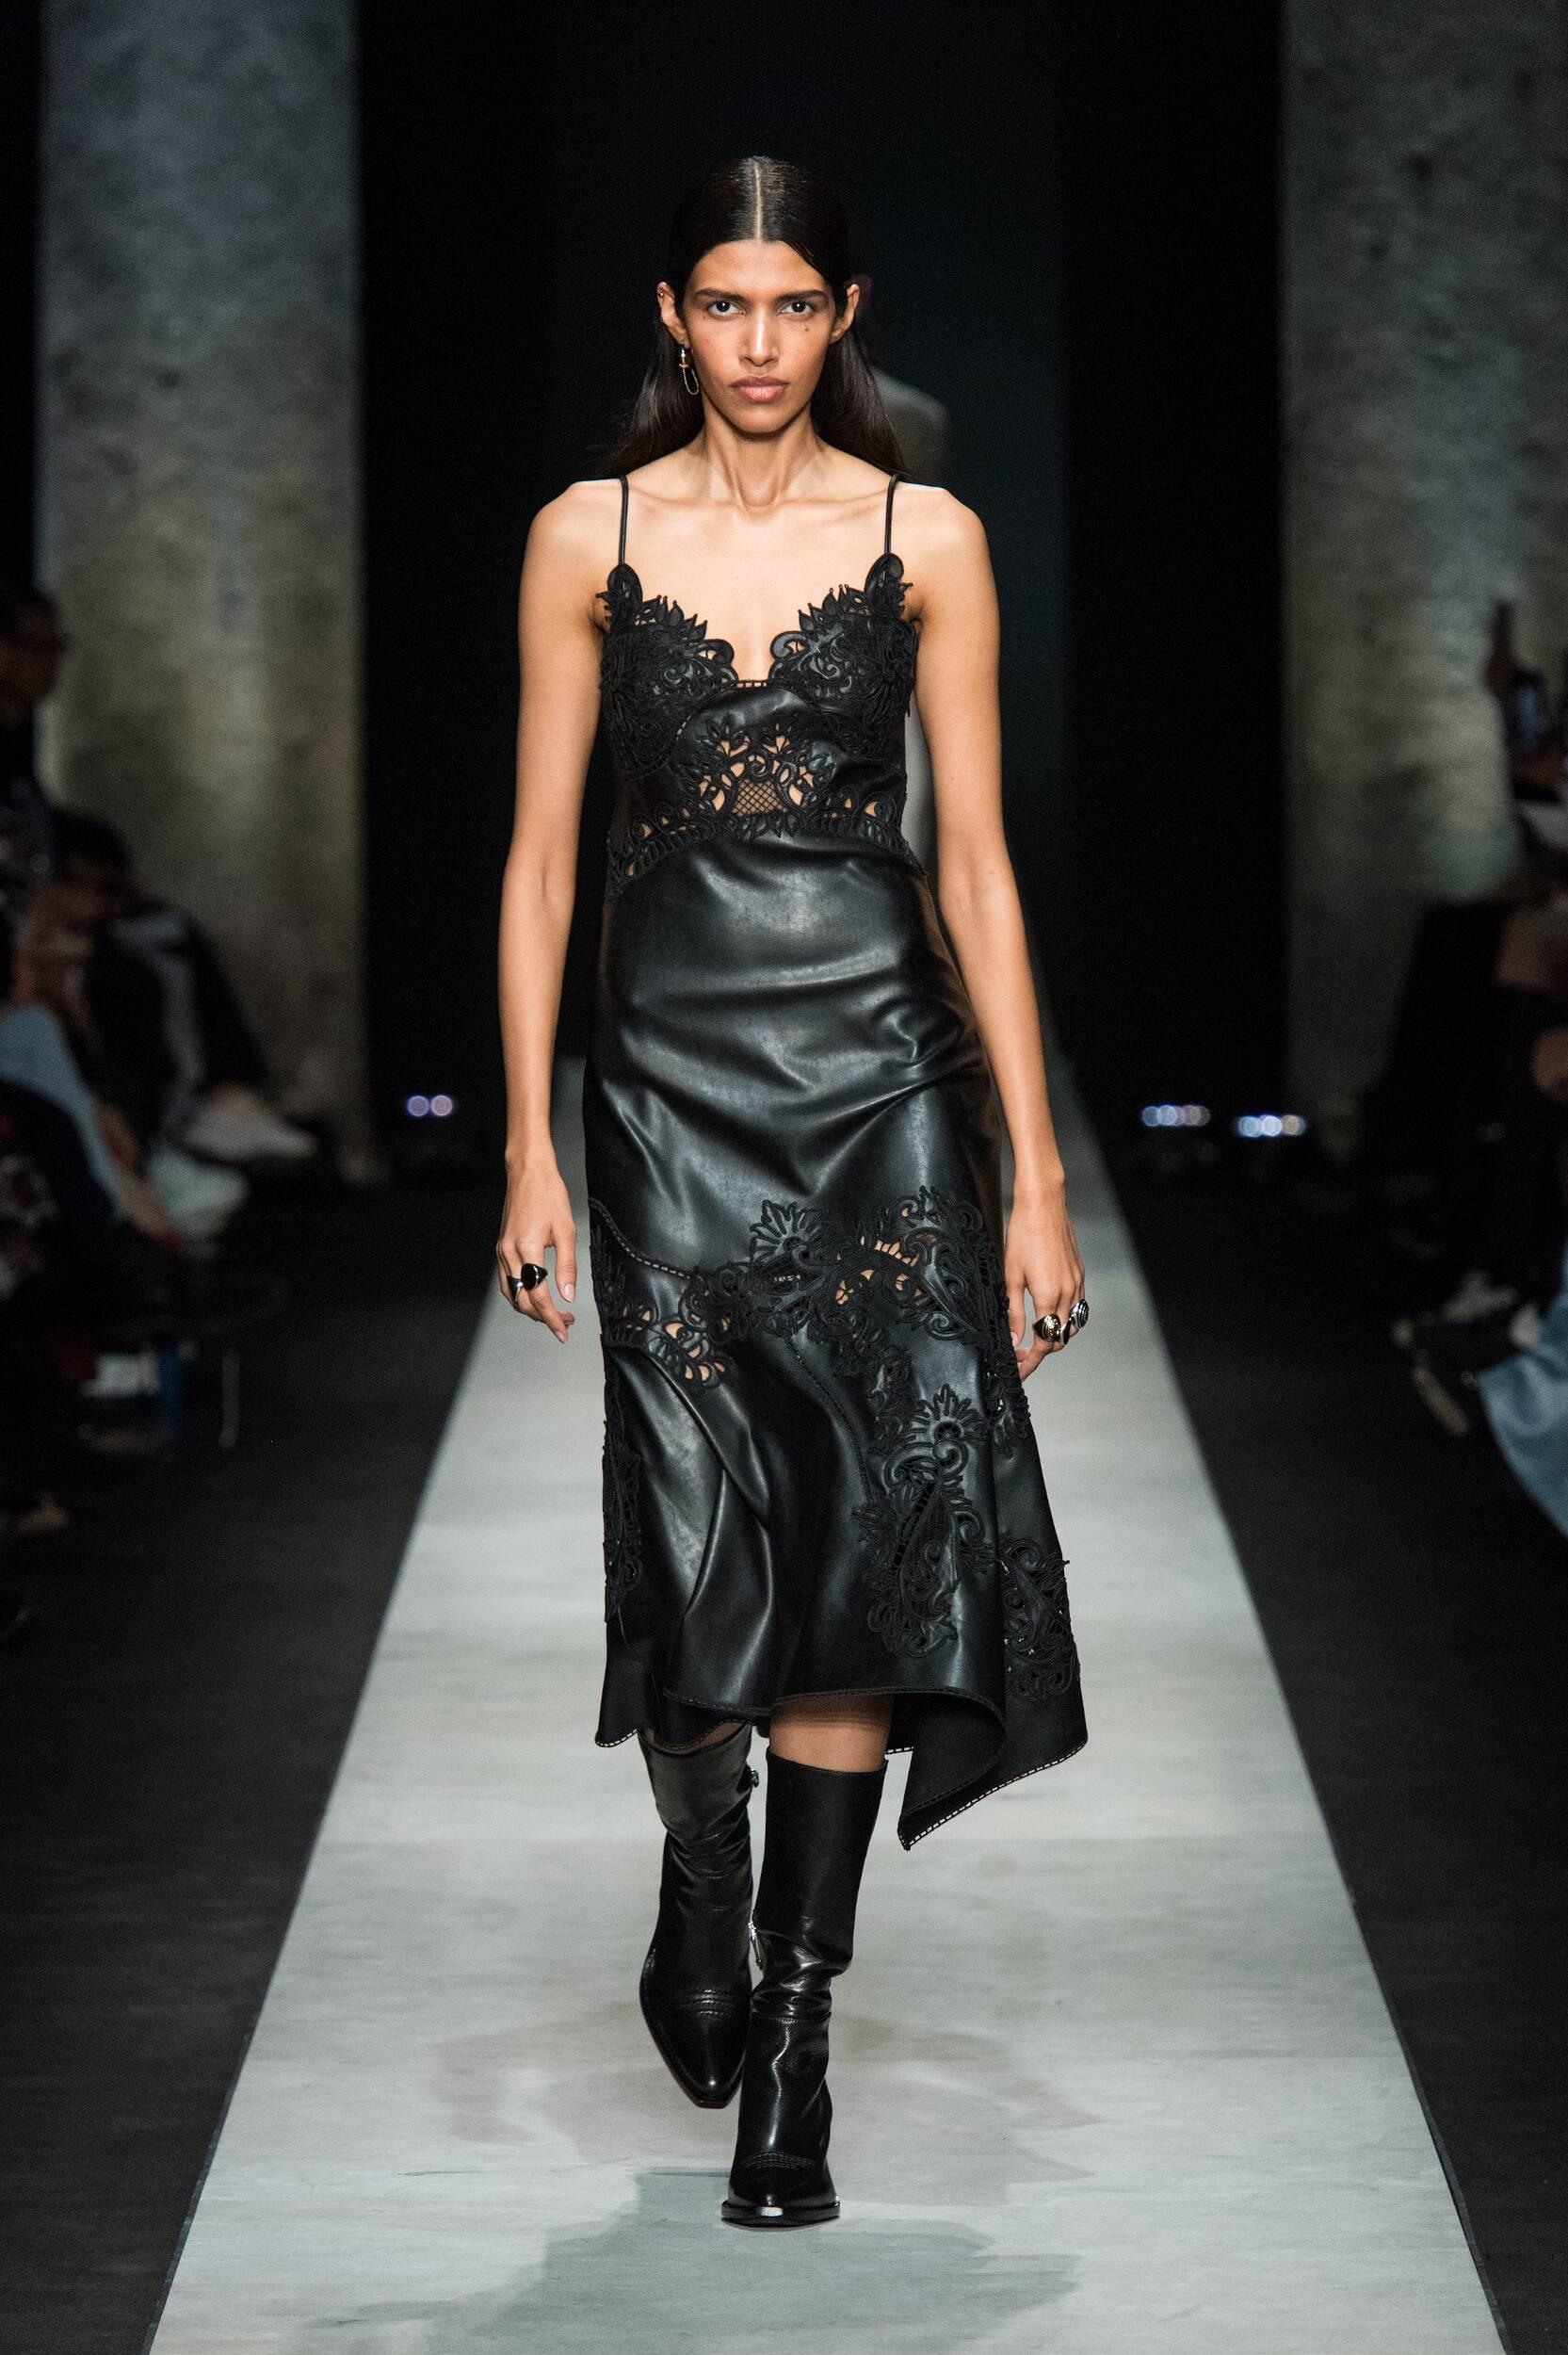 Runway Ermanno Scervino Fall Winter 2020 Women's Collection Milan Fashion Week